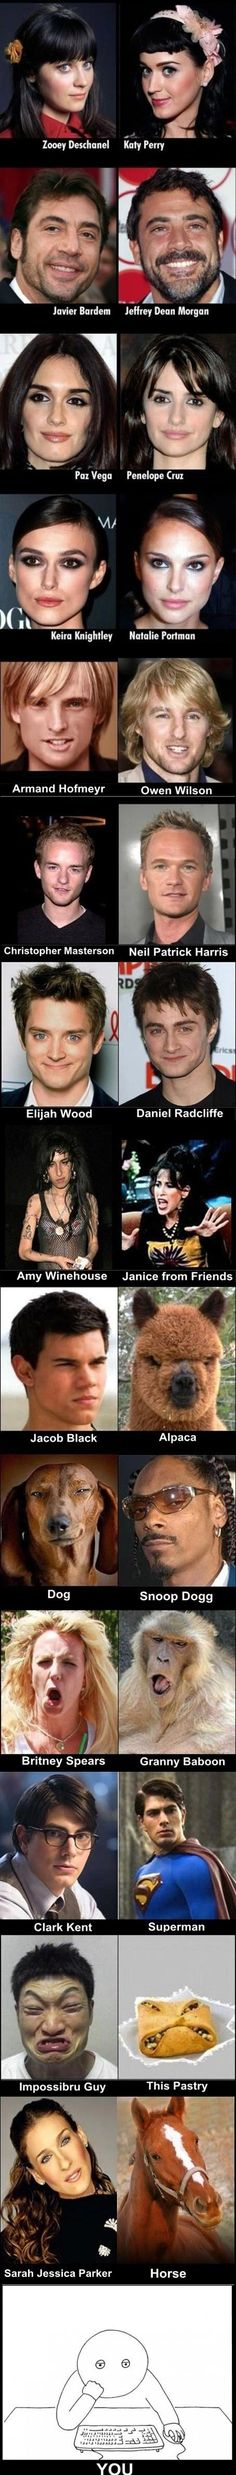 Celebrity lookalikes... Hilarious :D